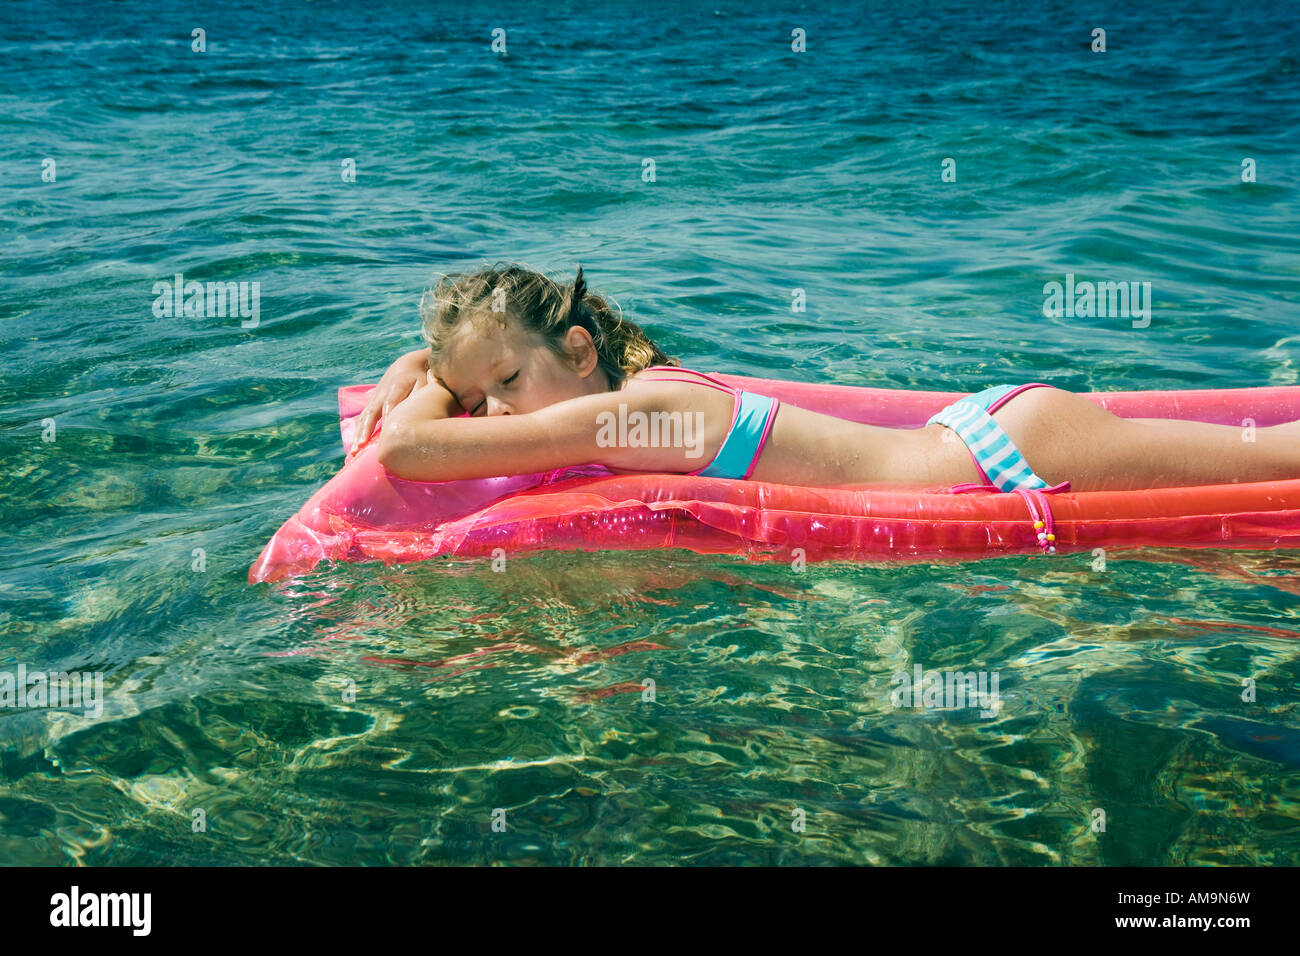 Young girl sleeping floating on an inflatable raft. Stock Photo